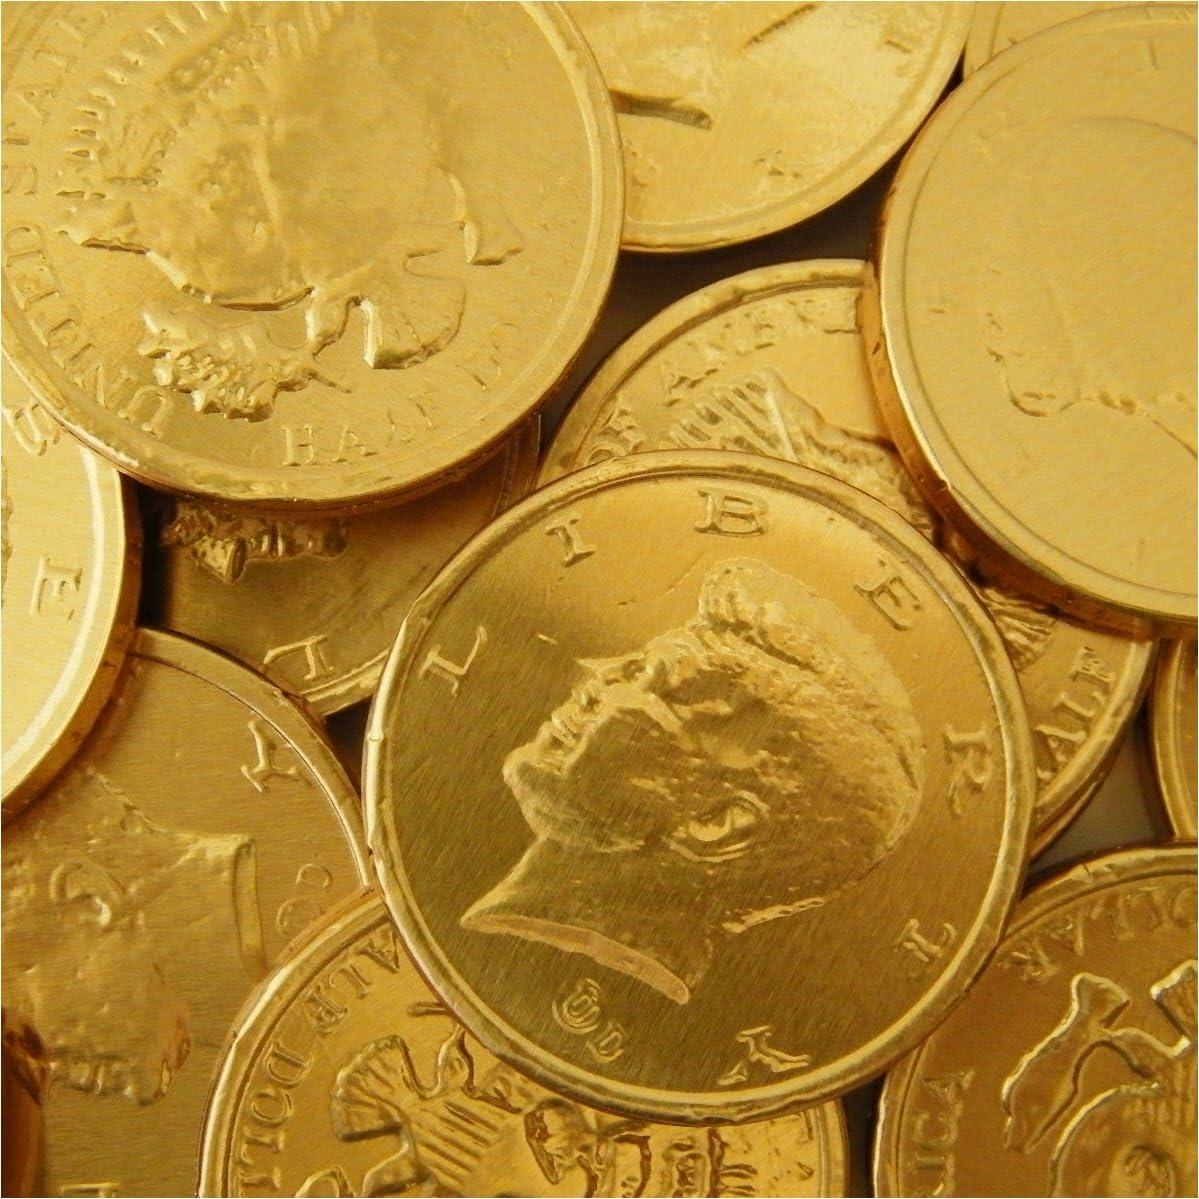 B000ID0NNS Chocolate Large Gold Coins 5lb 81fdRltxqjL